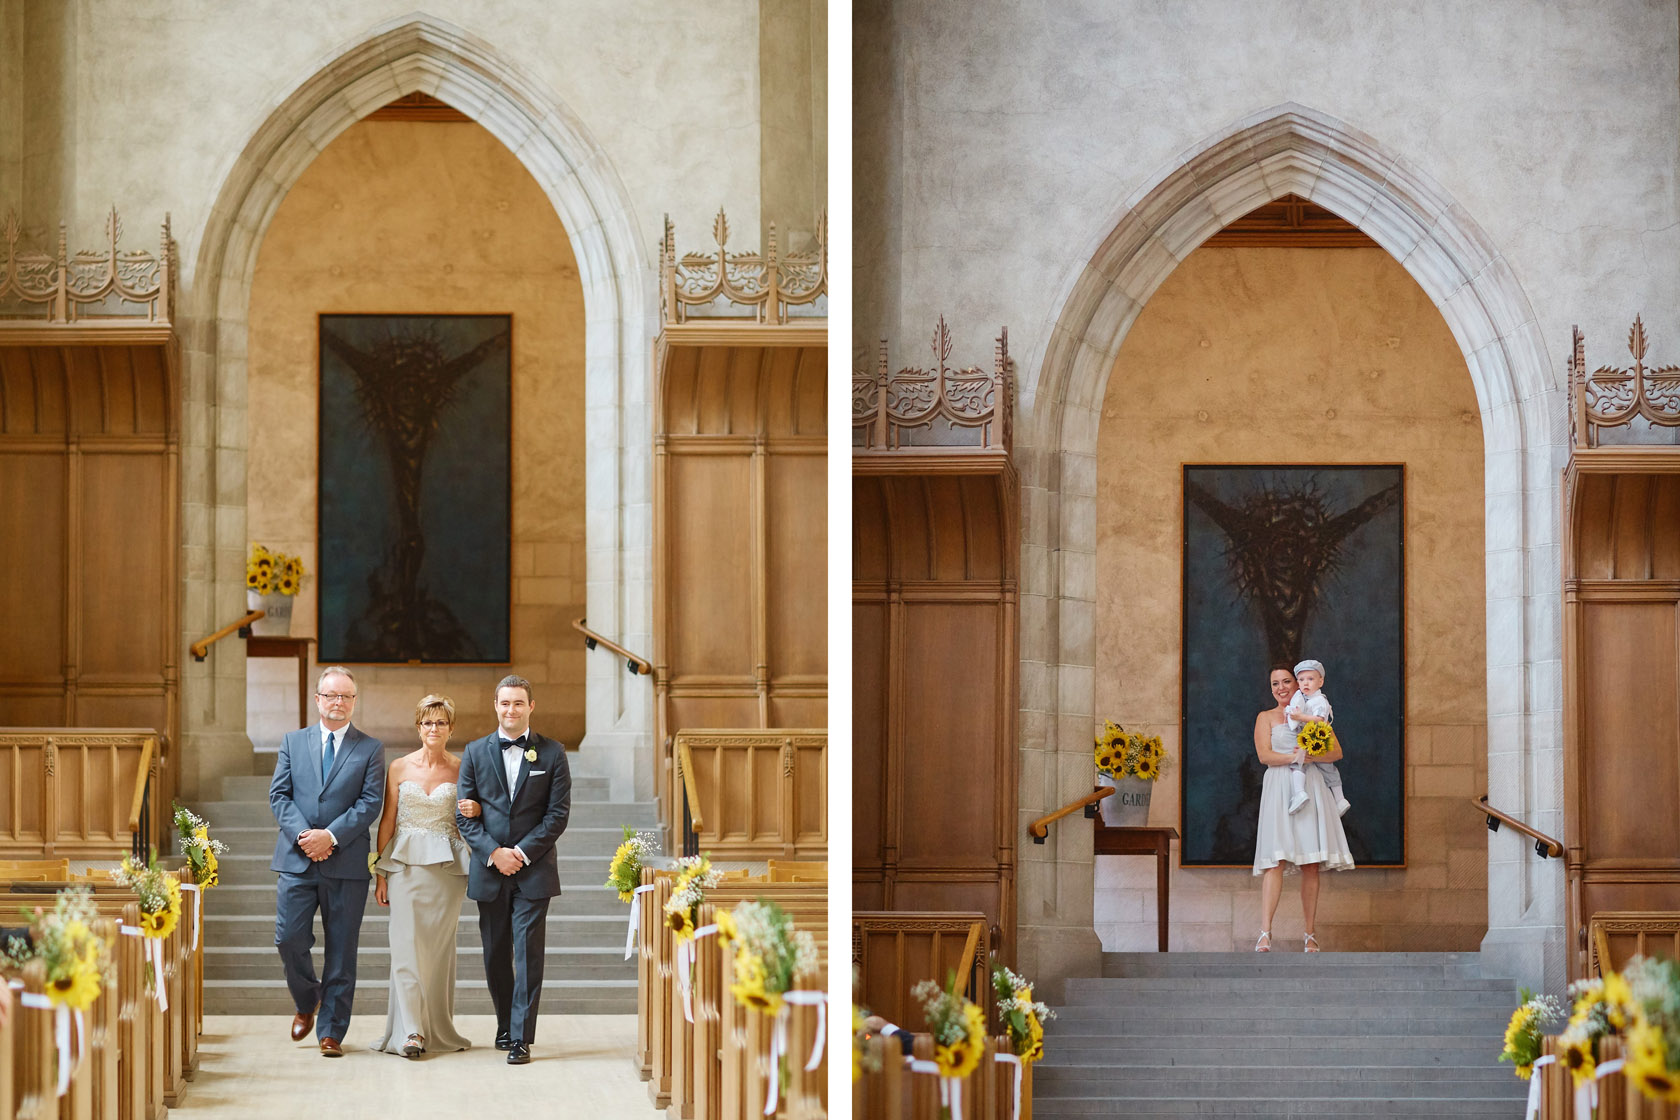 stephen sager photography 2021 toronto wedding photography